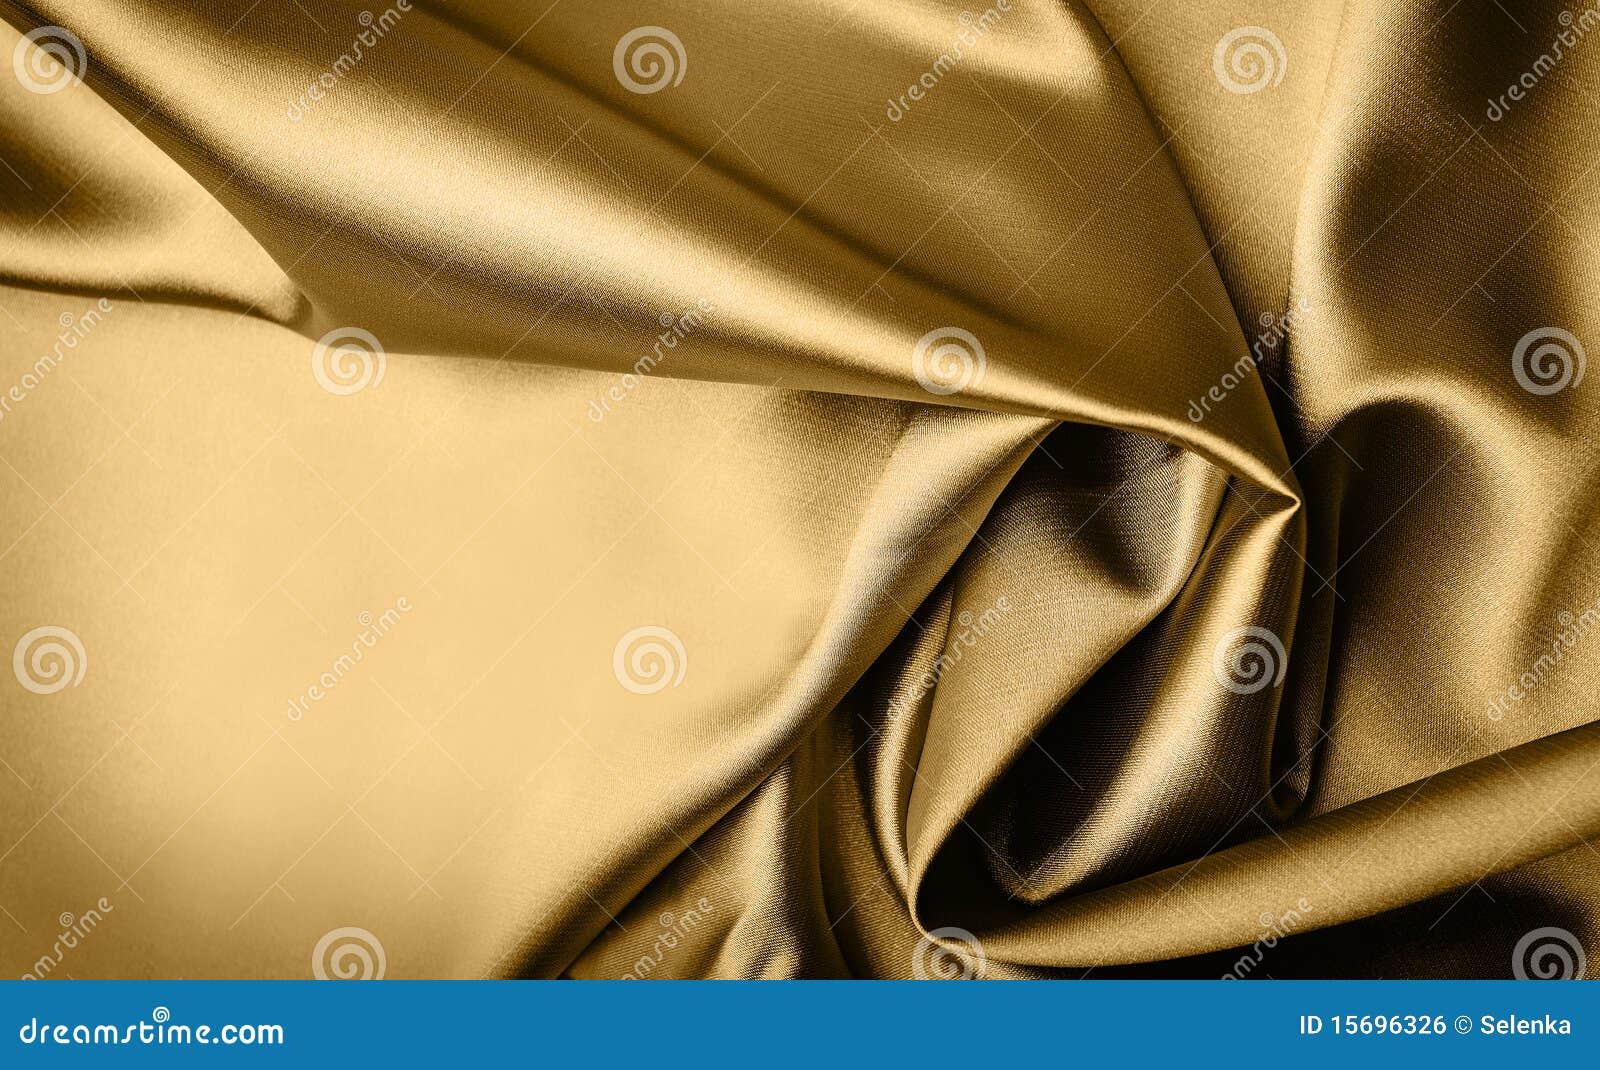 gold satin background - photo #39